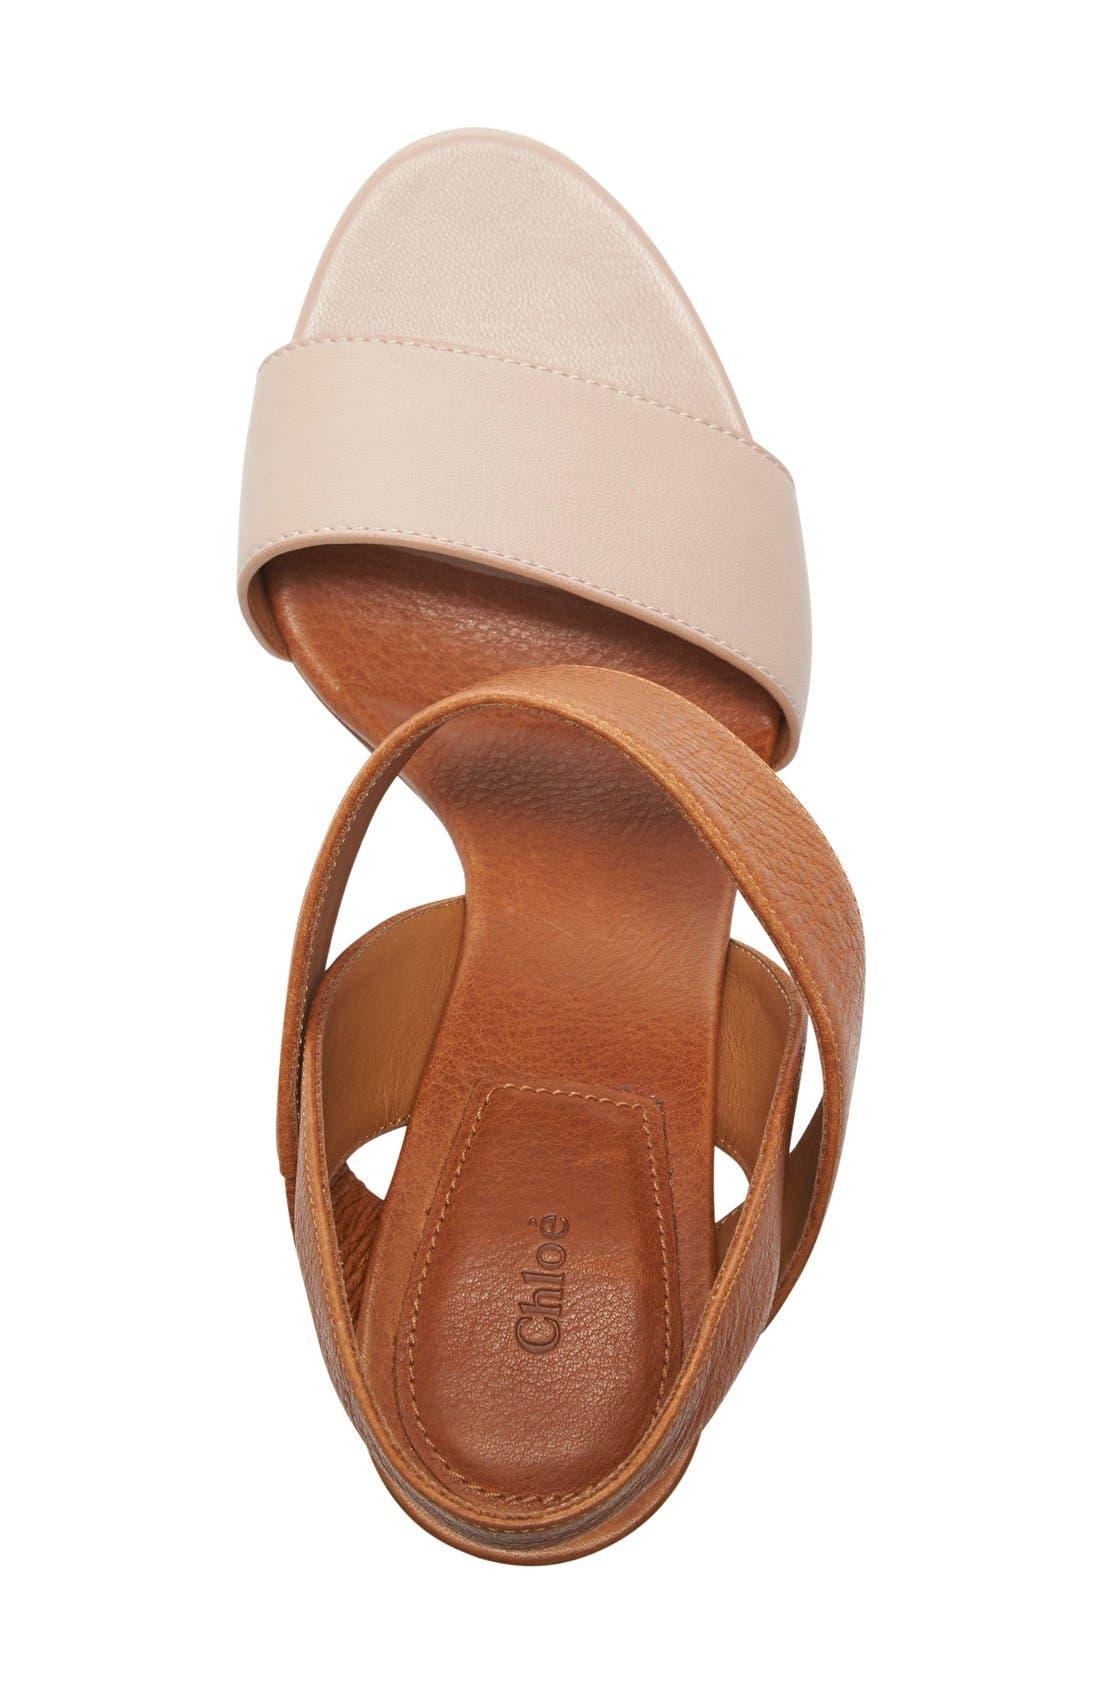 Alternate Image 3  - Chloé Mia Block Heel Sandal (Women)